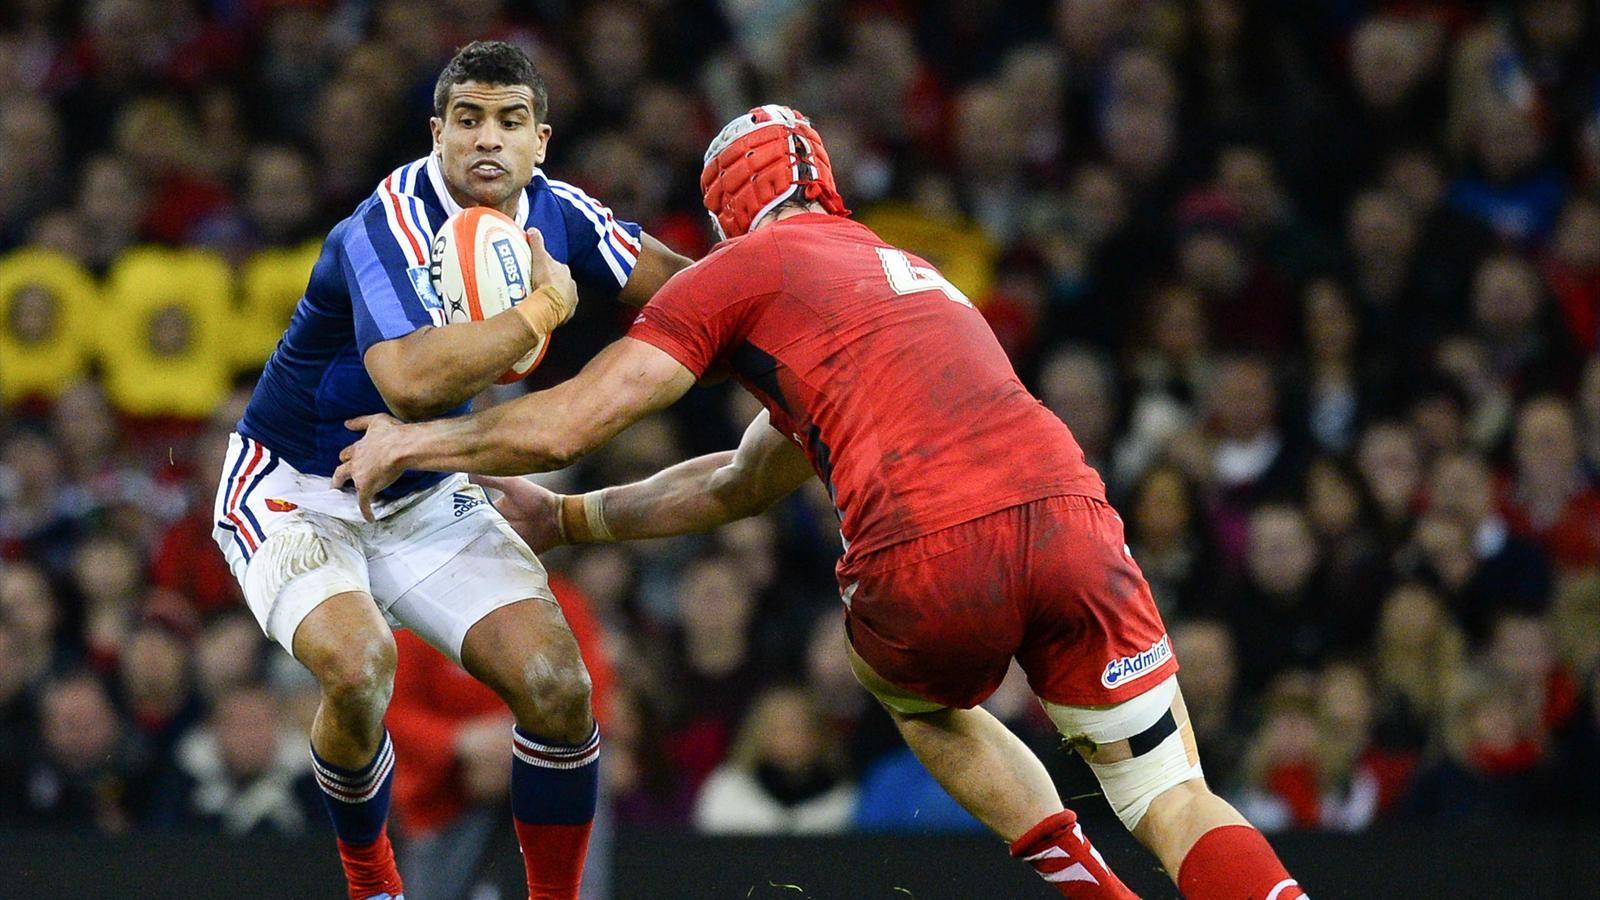 Wesley FOFANA (avec images) Rugby, Pays de galles, France